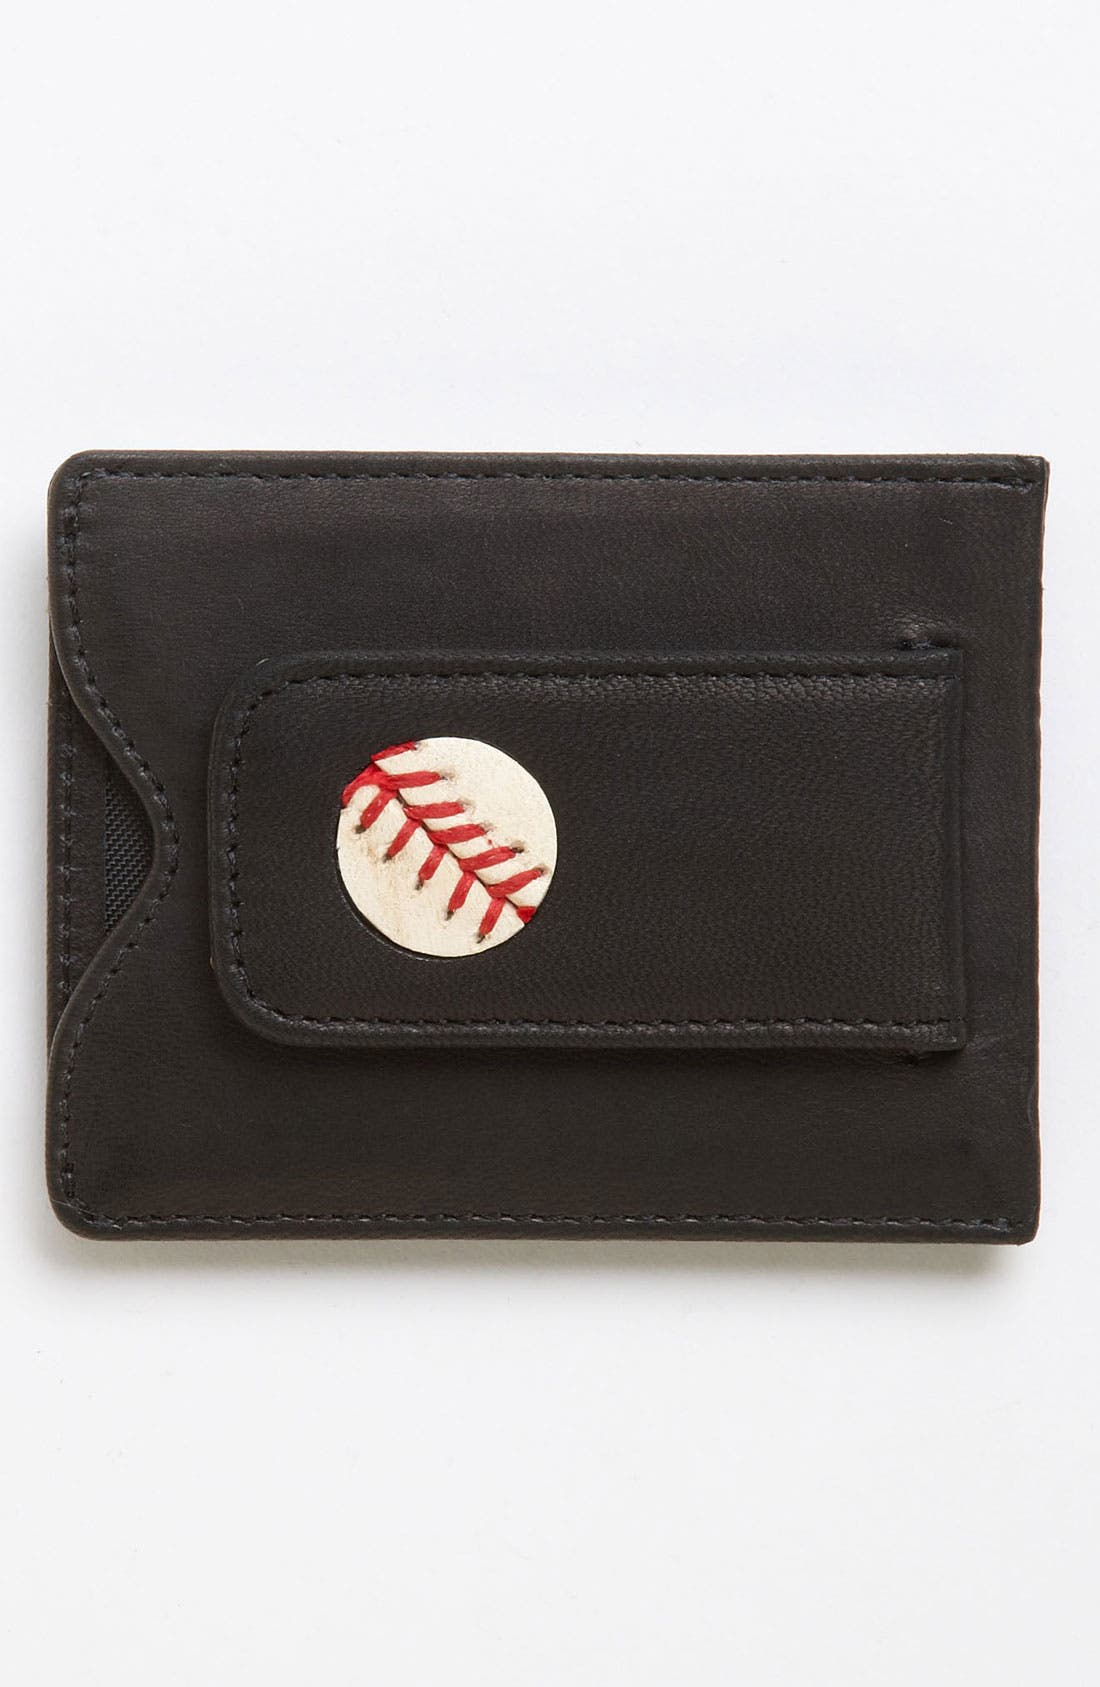 Alternate Image 1 Selected - Tokens & Icons 'Toronto Blue Jays' MLB™ Game-Played-Baseball Card Case